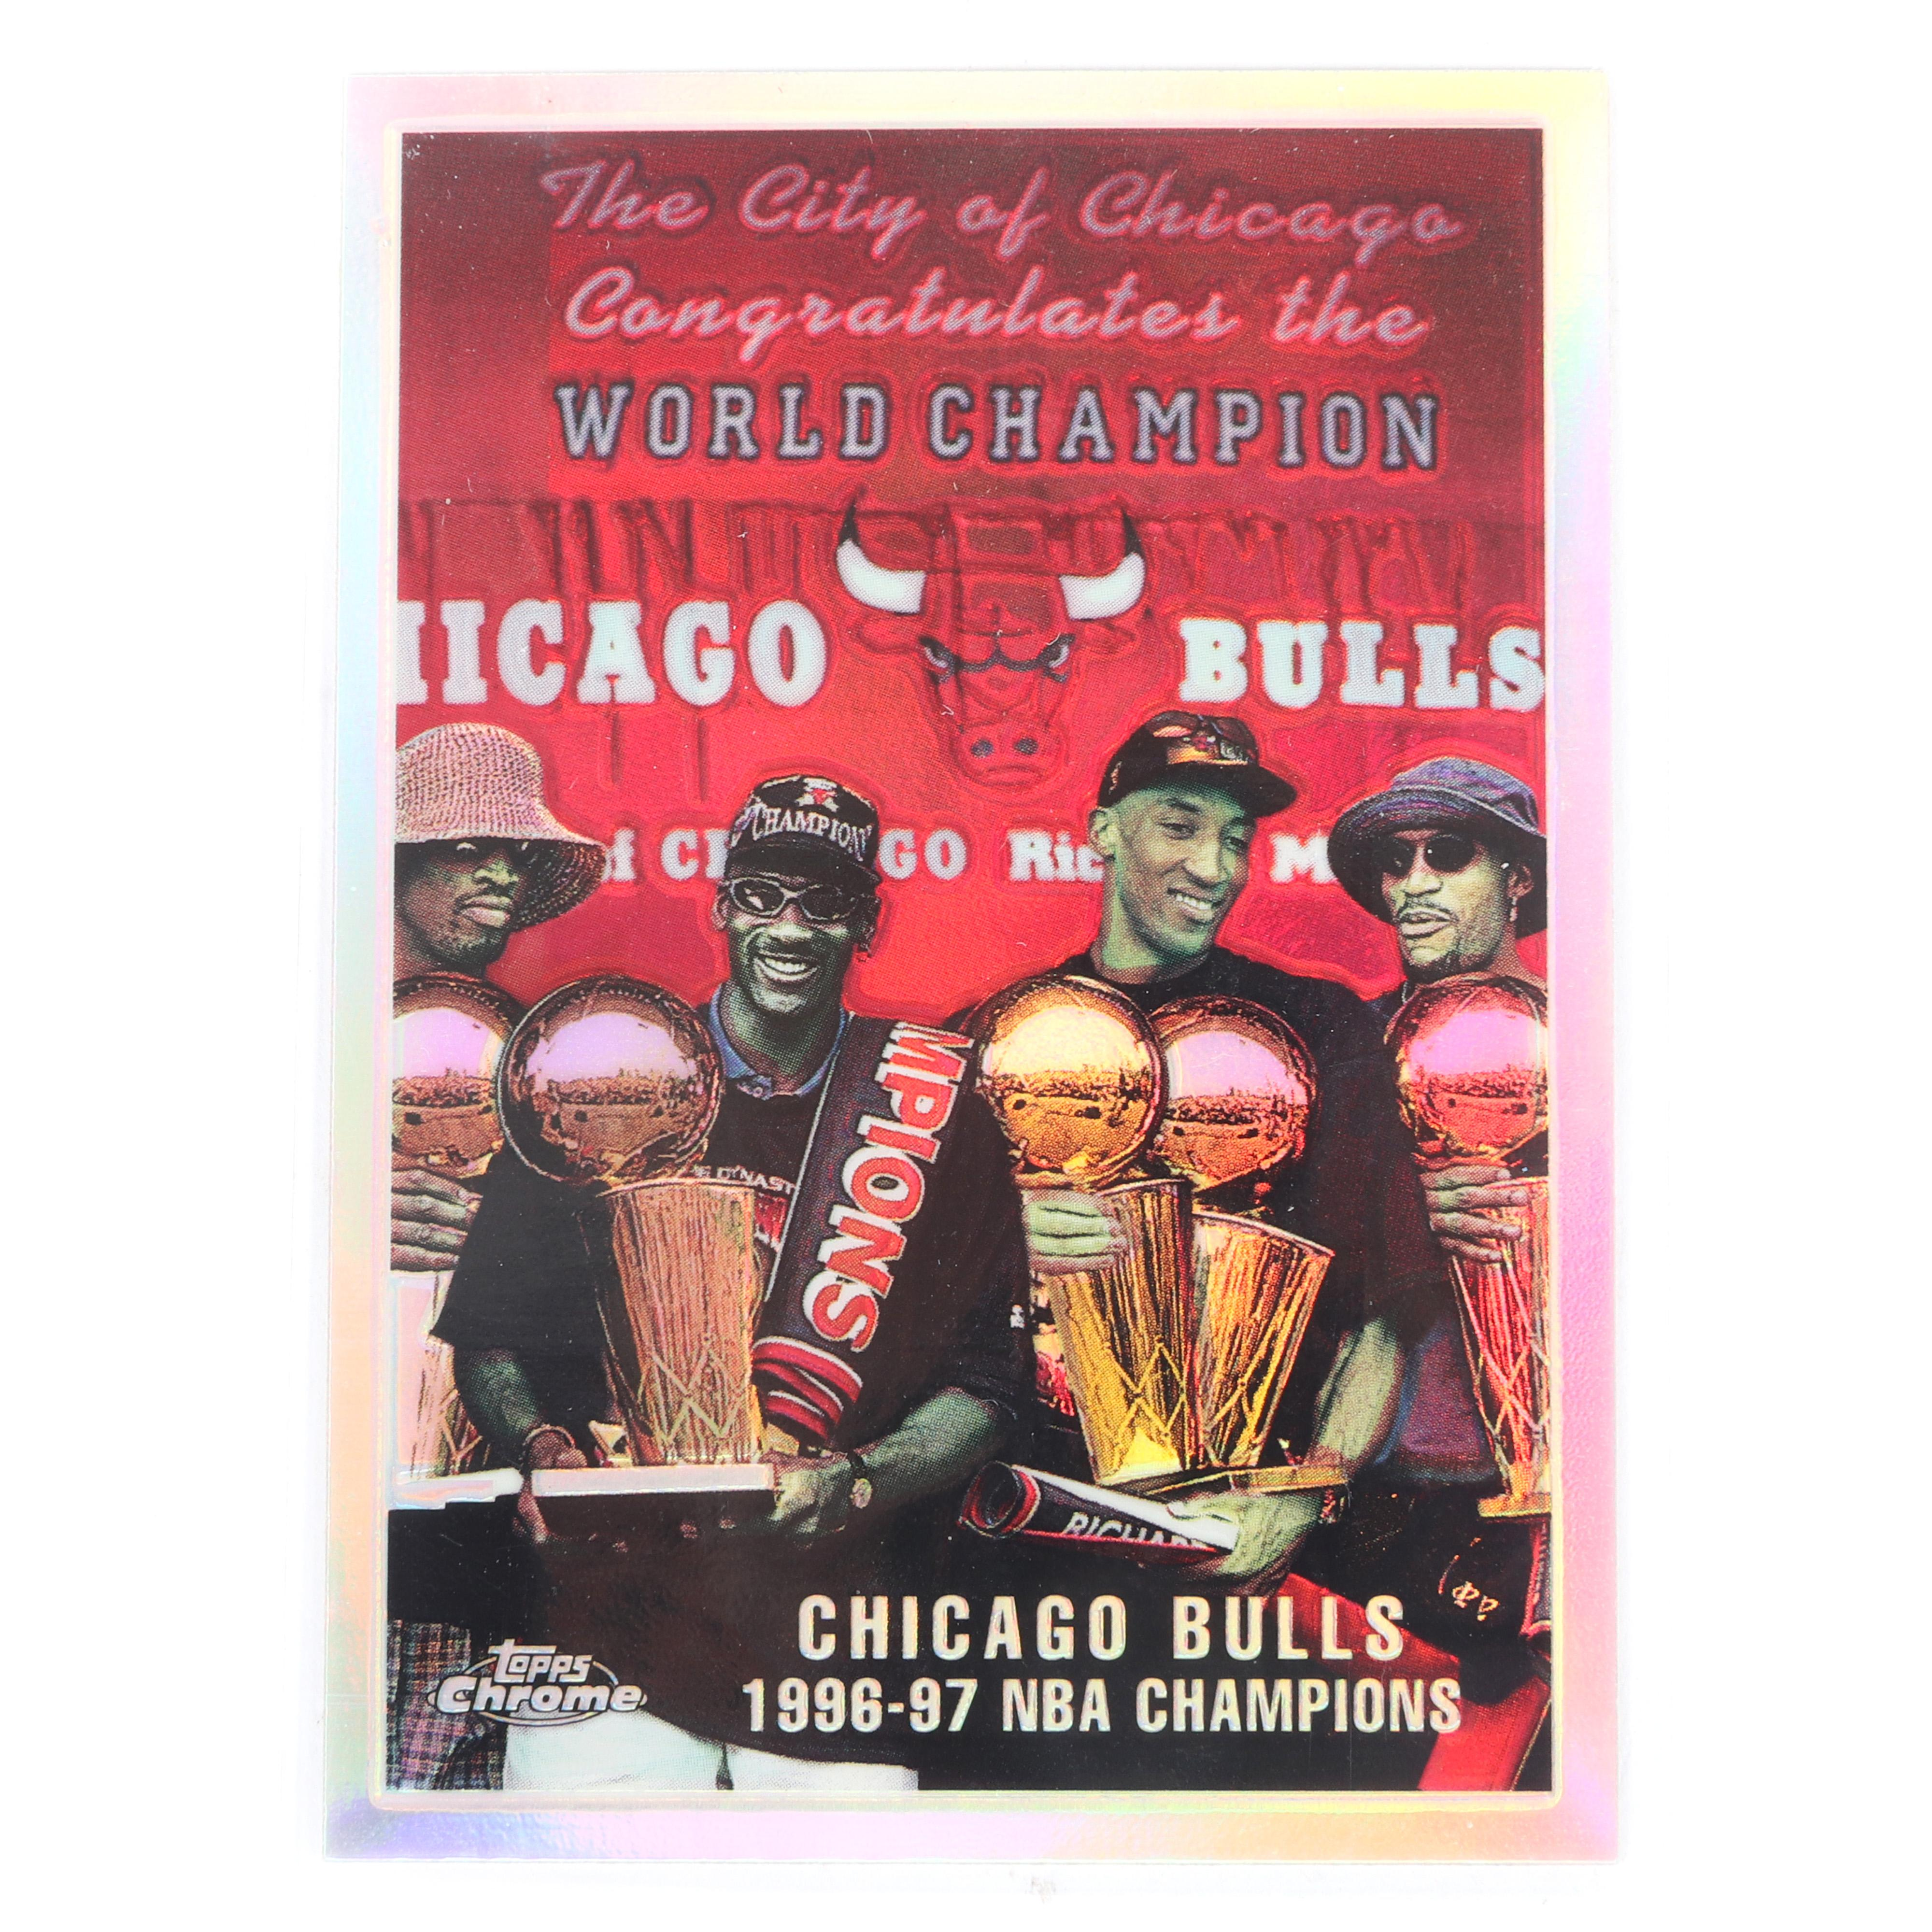 1997-98 Topps Chrome Refractor Chicago Bulls NBA Champions Checklist #51